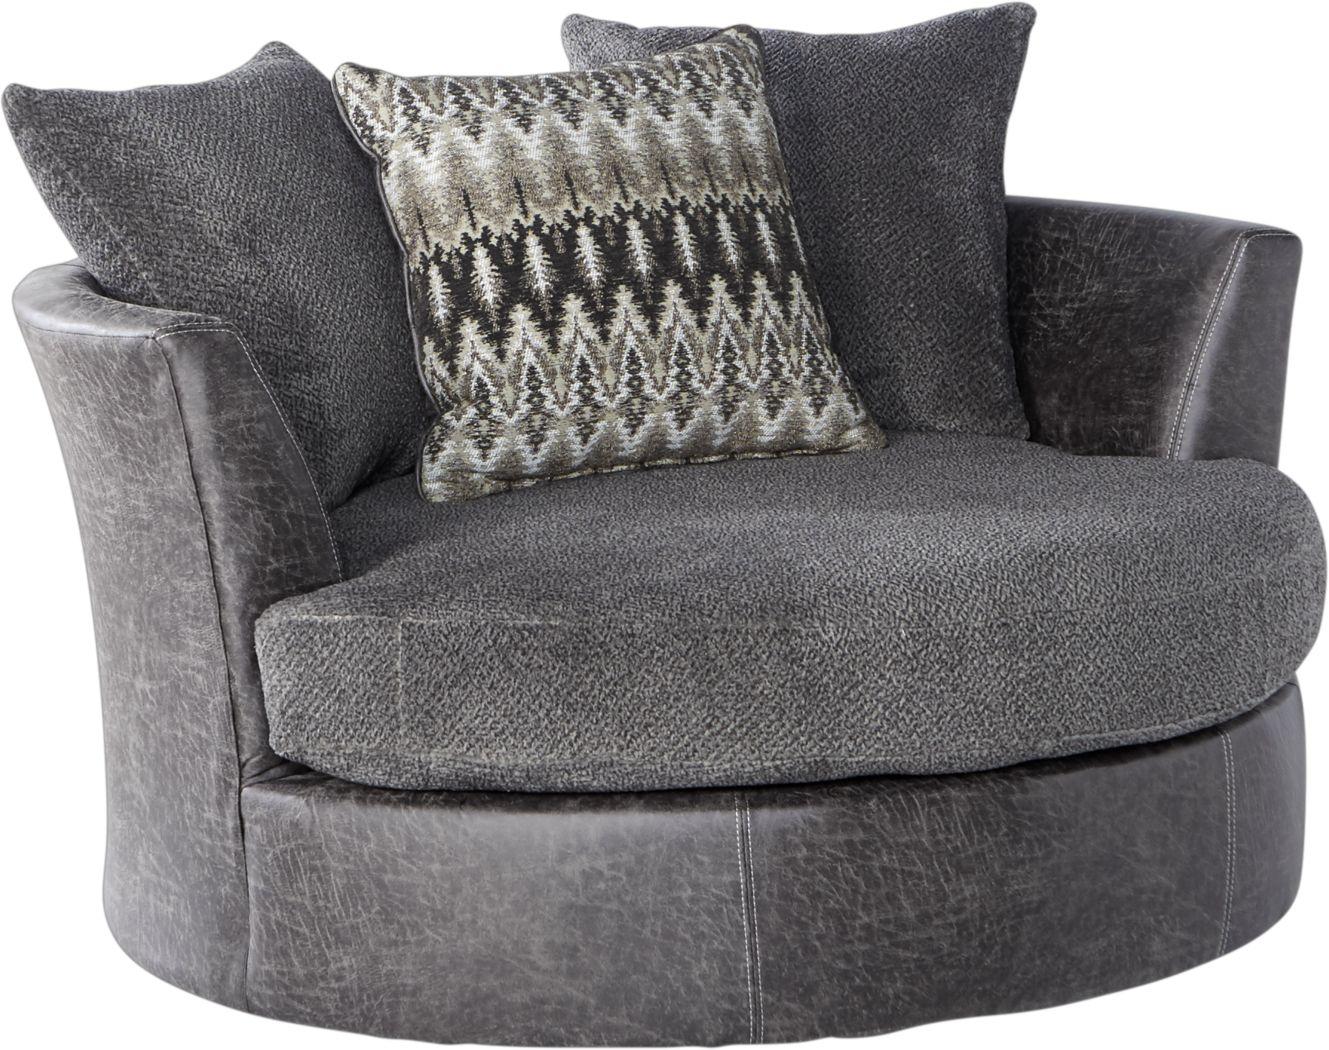 Skyline Park Gray Swivel Chair